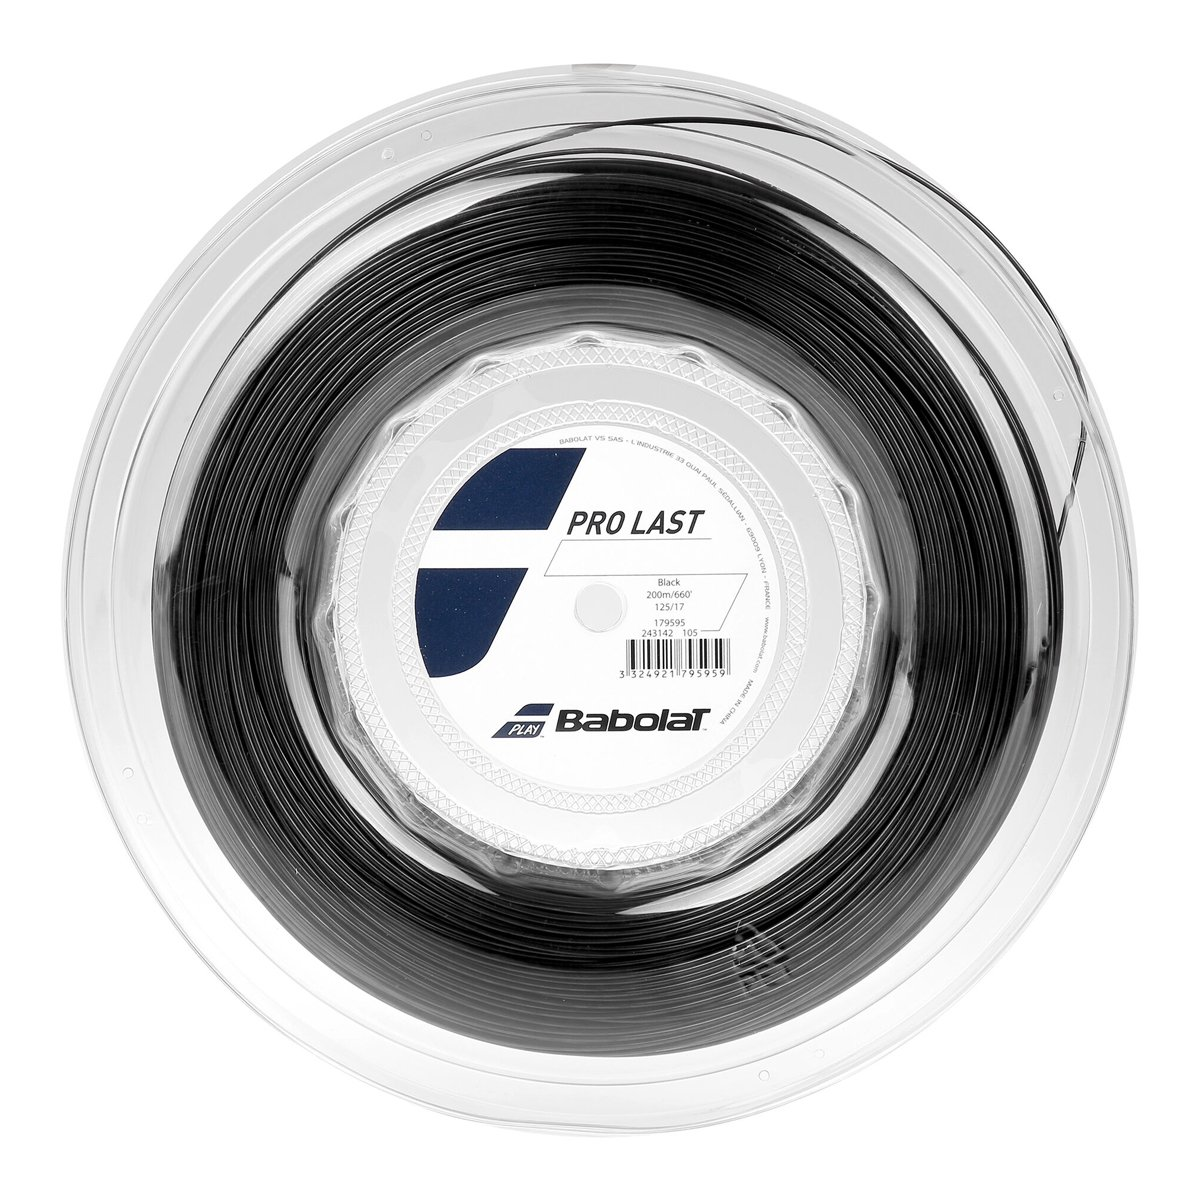 Corda Babolat Pro Last 17/1,25mm - Rolo com 200mts